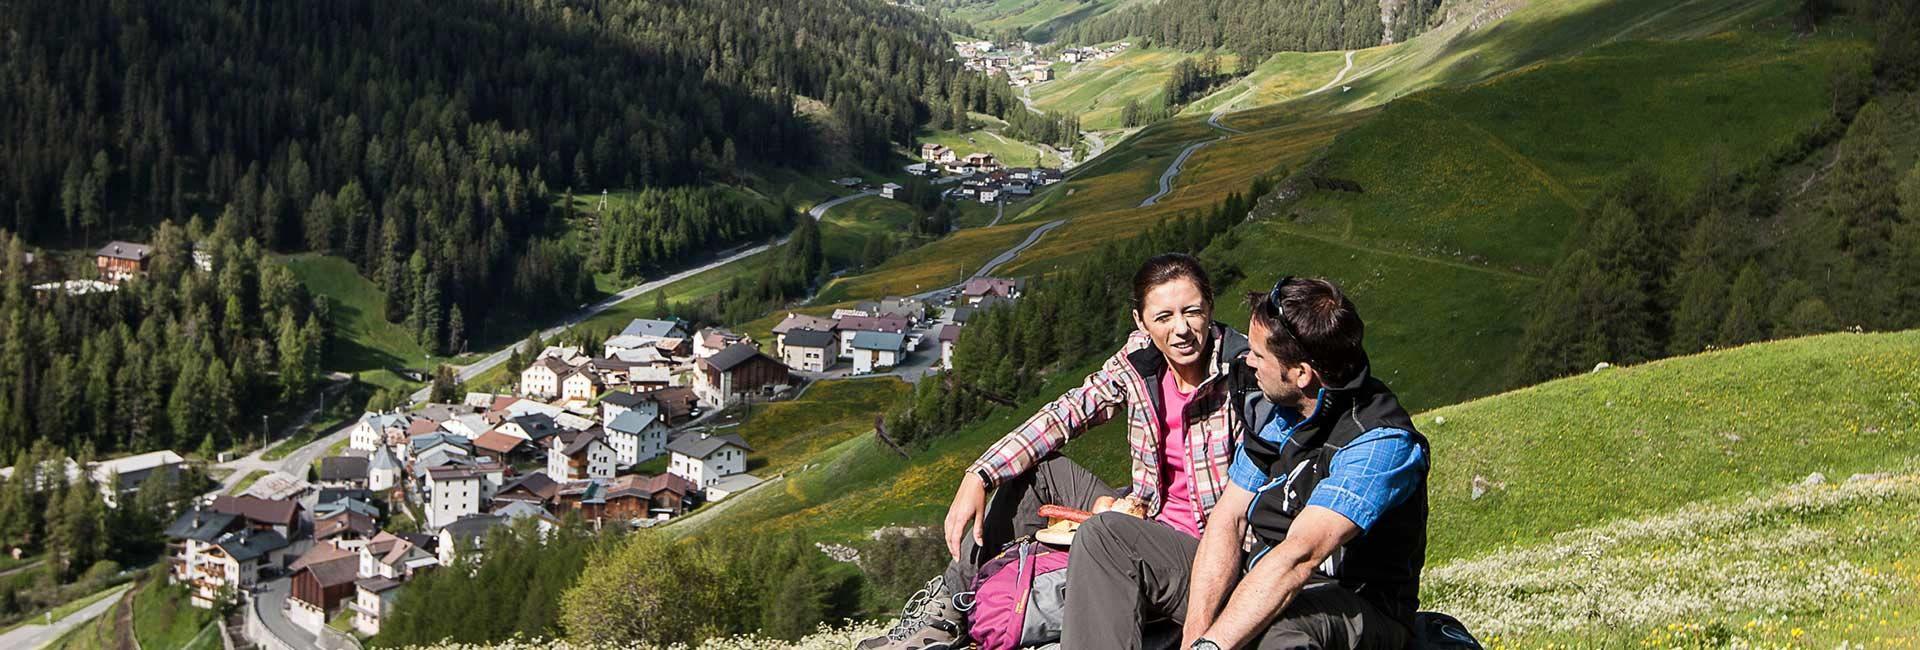 Samnaun Sommerurlaub Schmugglertage Hotel Romantica